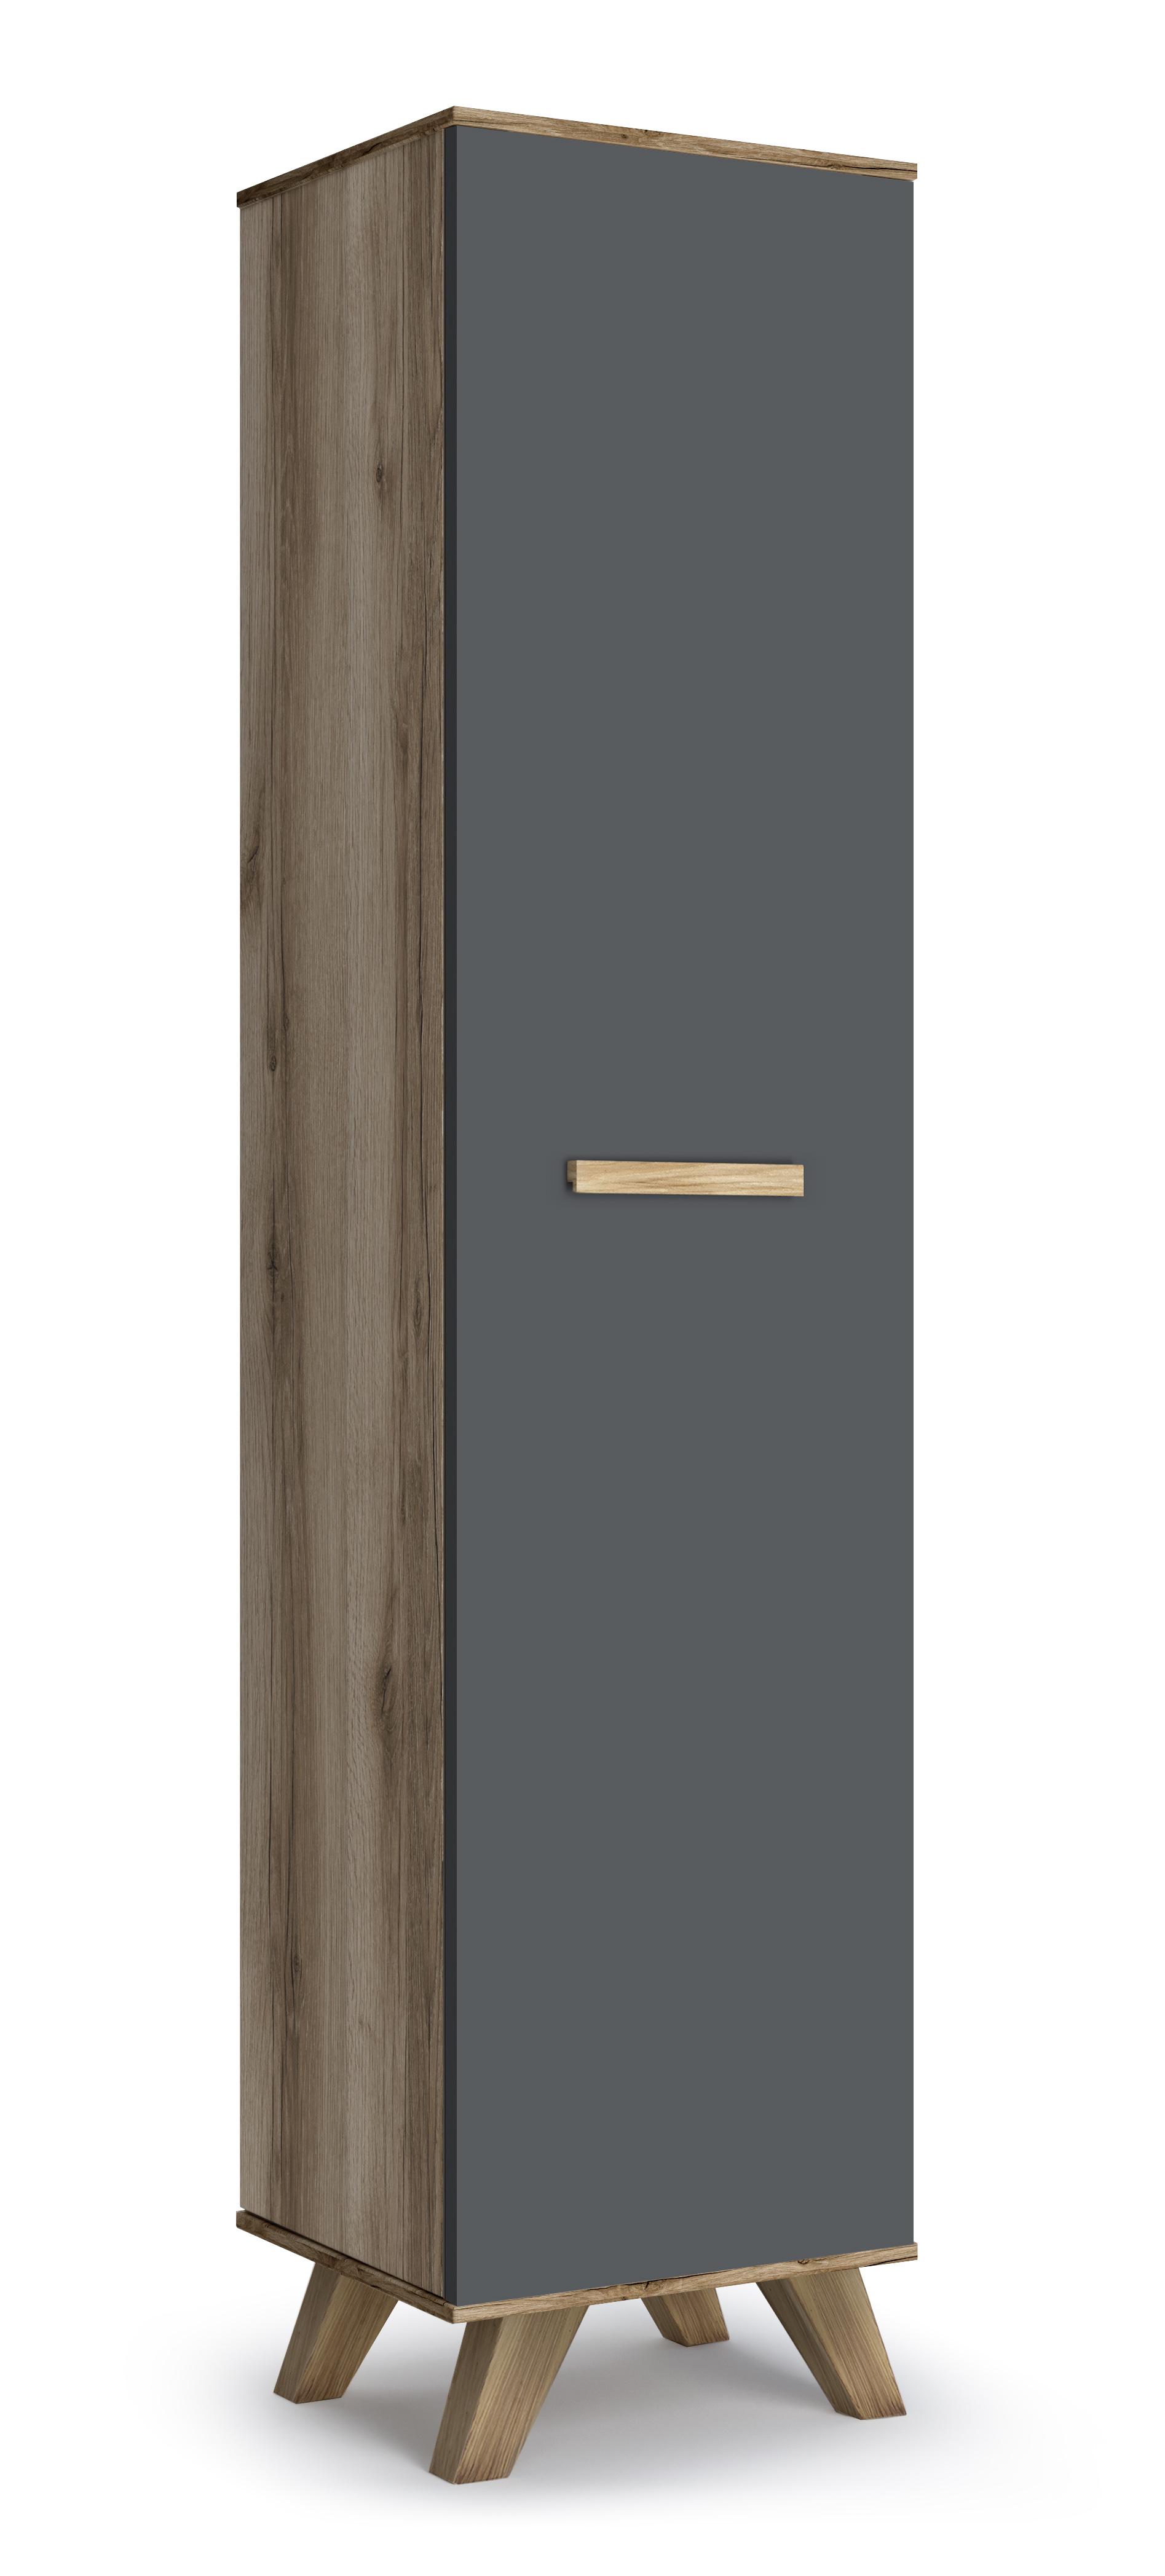 Шкаф 400 «Вега Скандинавия» (силк флай) Кураж